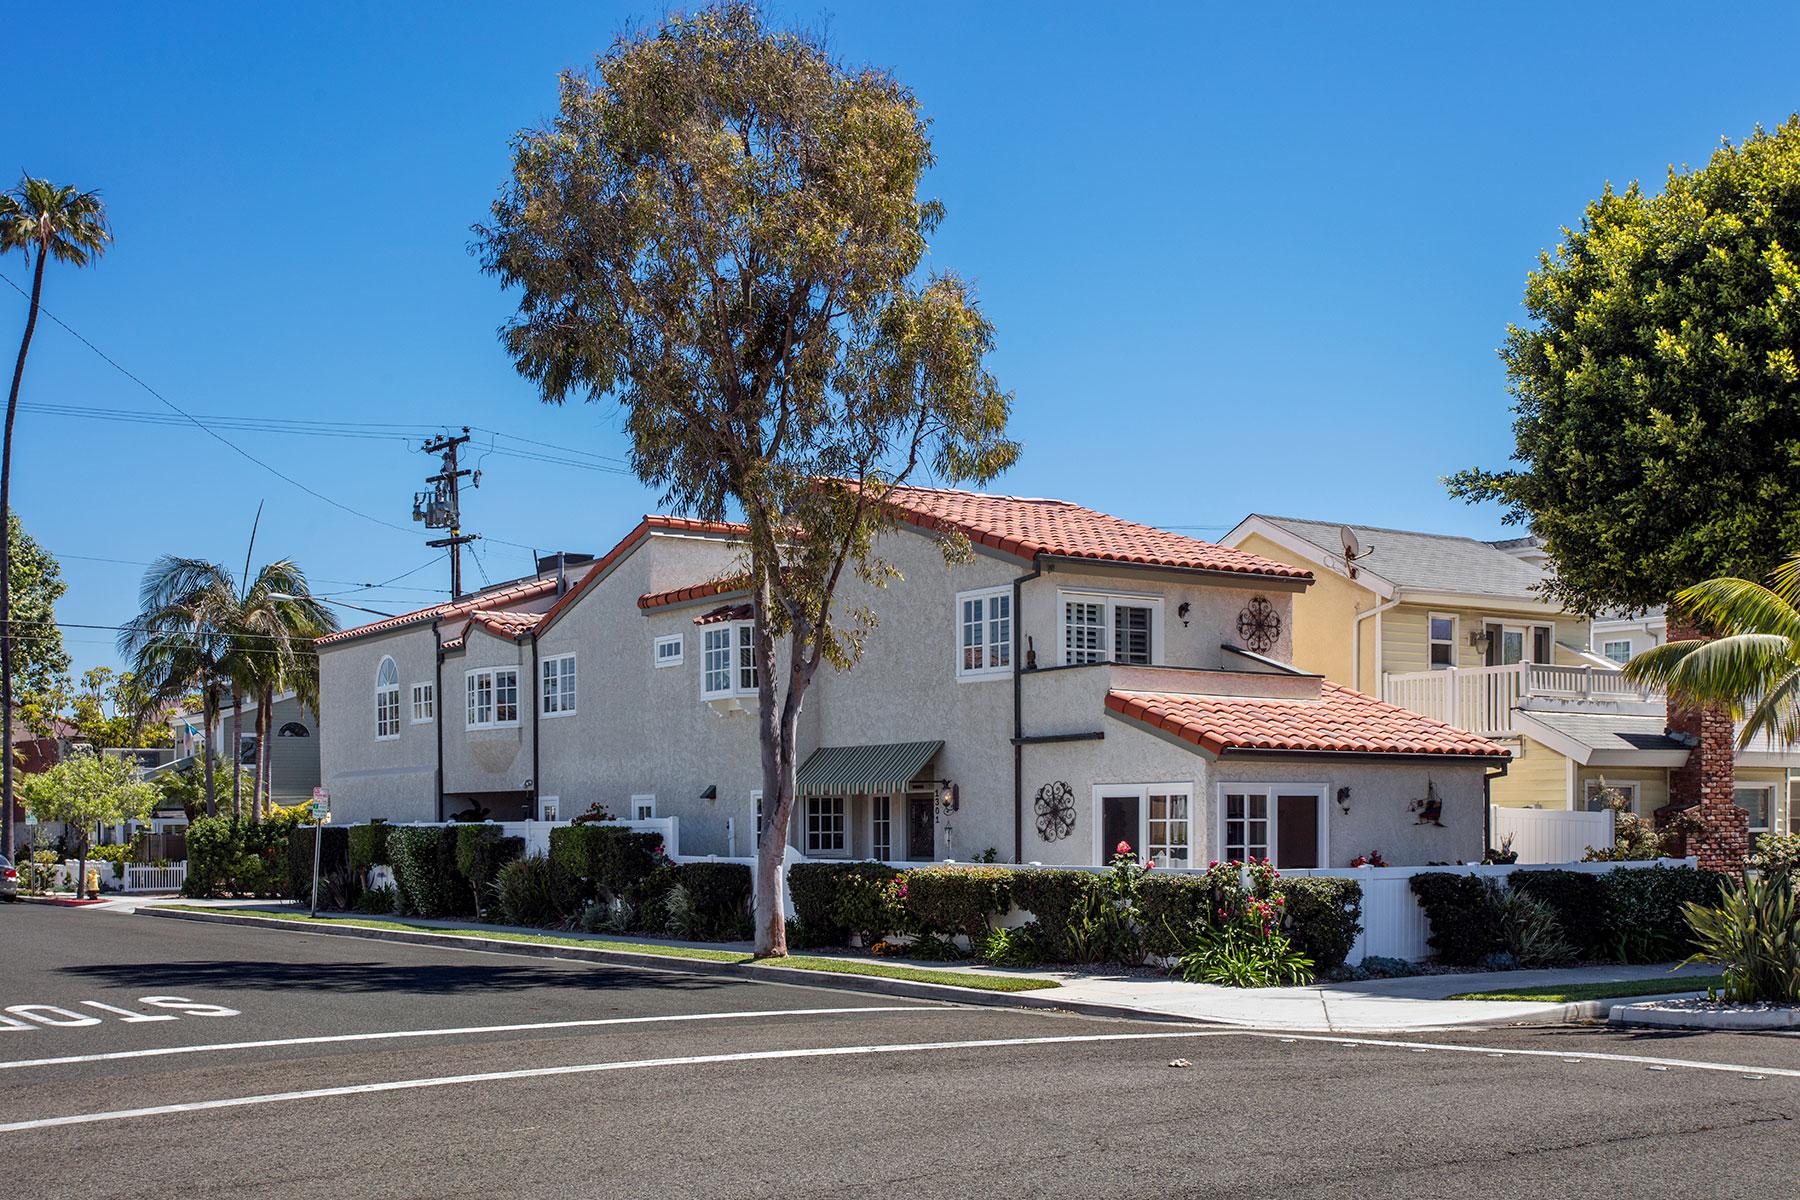 Nhà ở một gia đình vì Bán tại 1301 Ocean Seal Beach, California, 90740 Hoa Kỳ